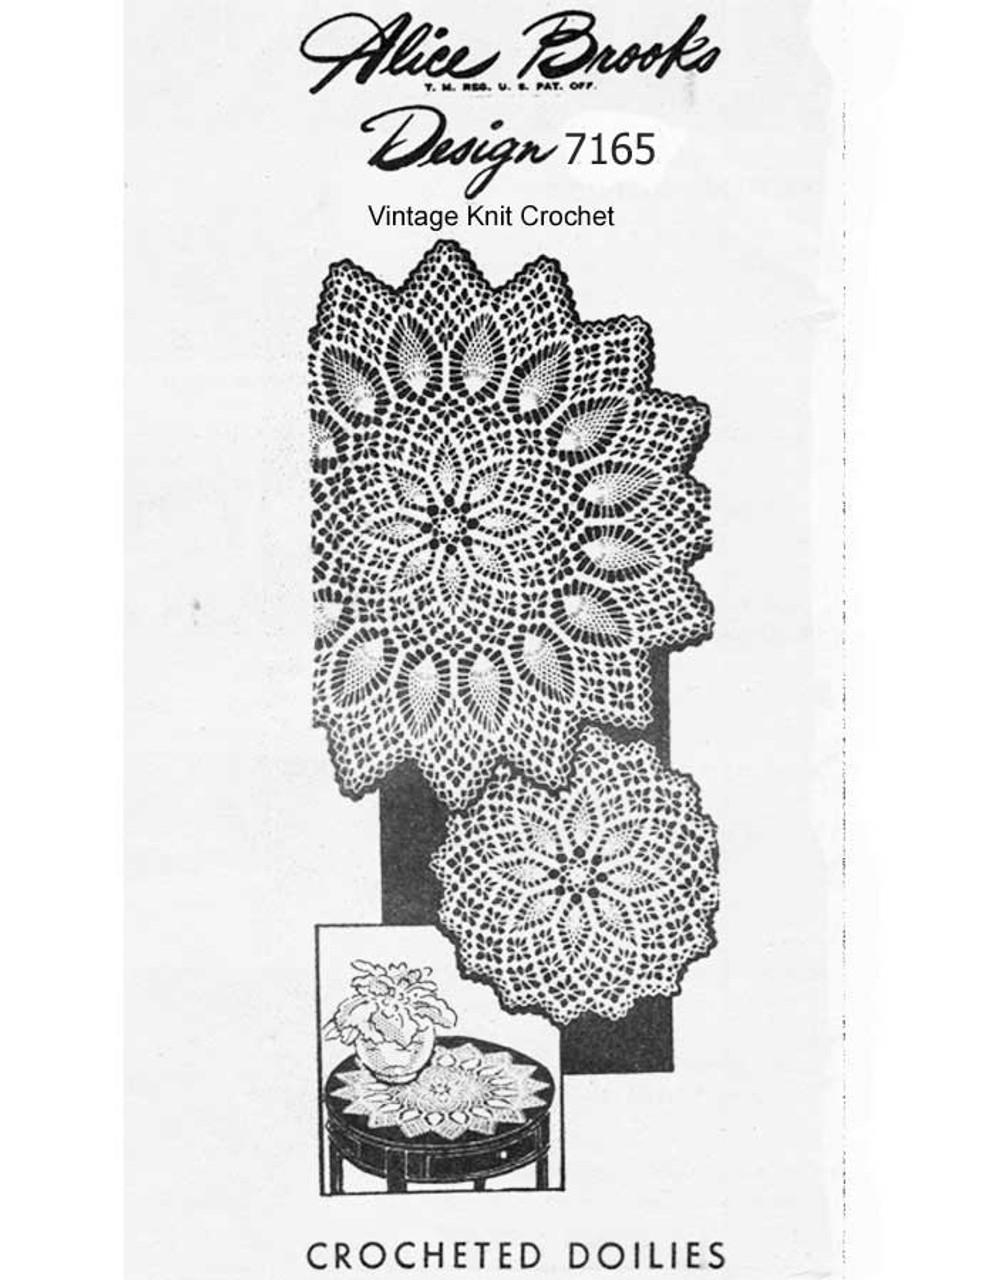 Pineapple Centerpiece Crochet Doily Pattern, Alice Brooks 7164